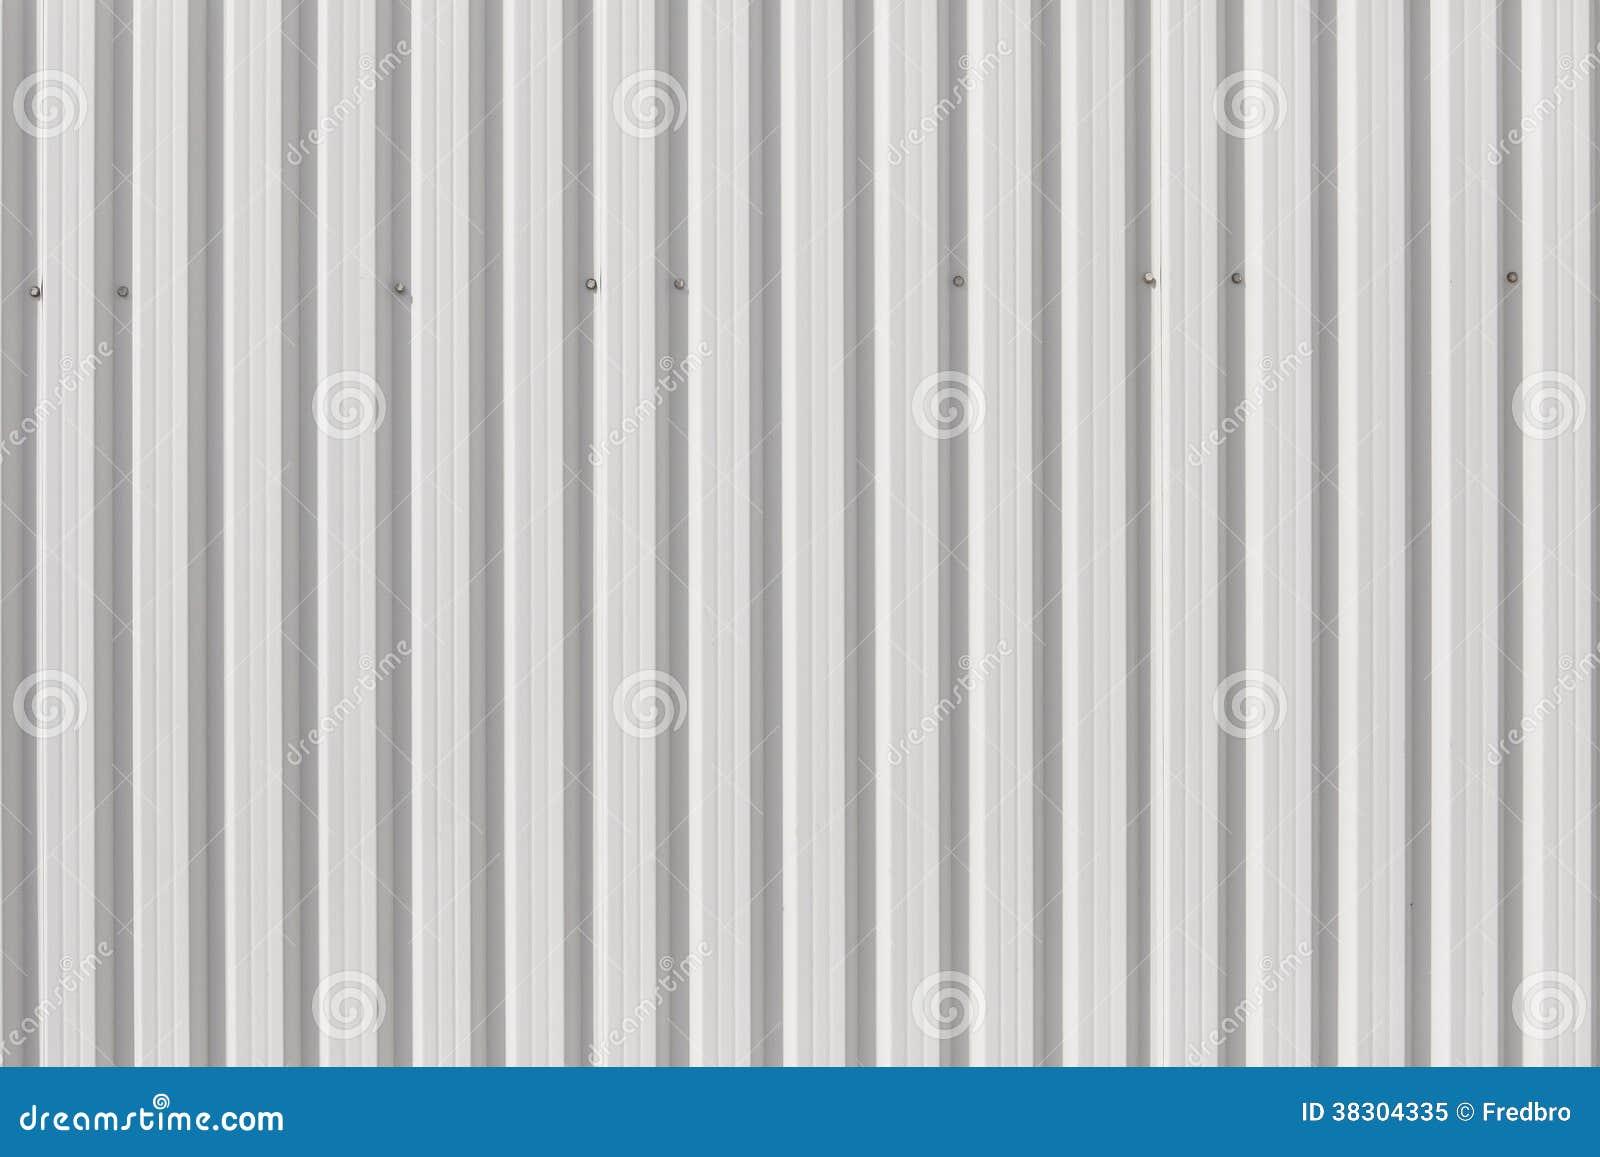 White Sheet Metal : Sheet cladding texture royalty free stock photo image